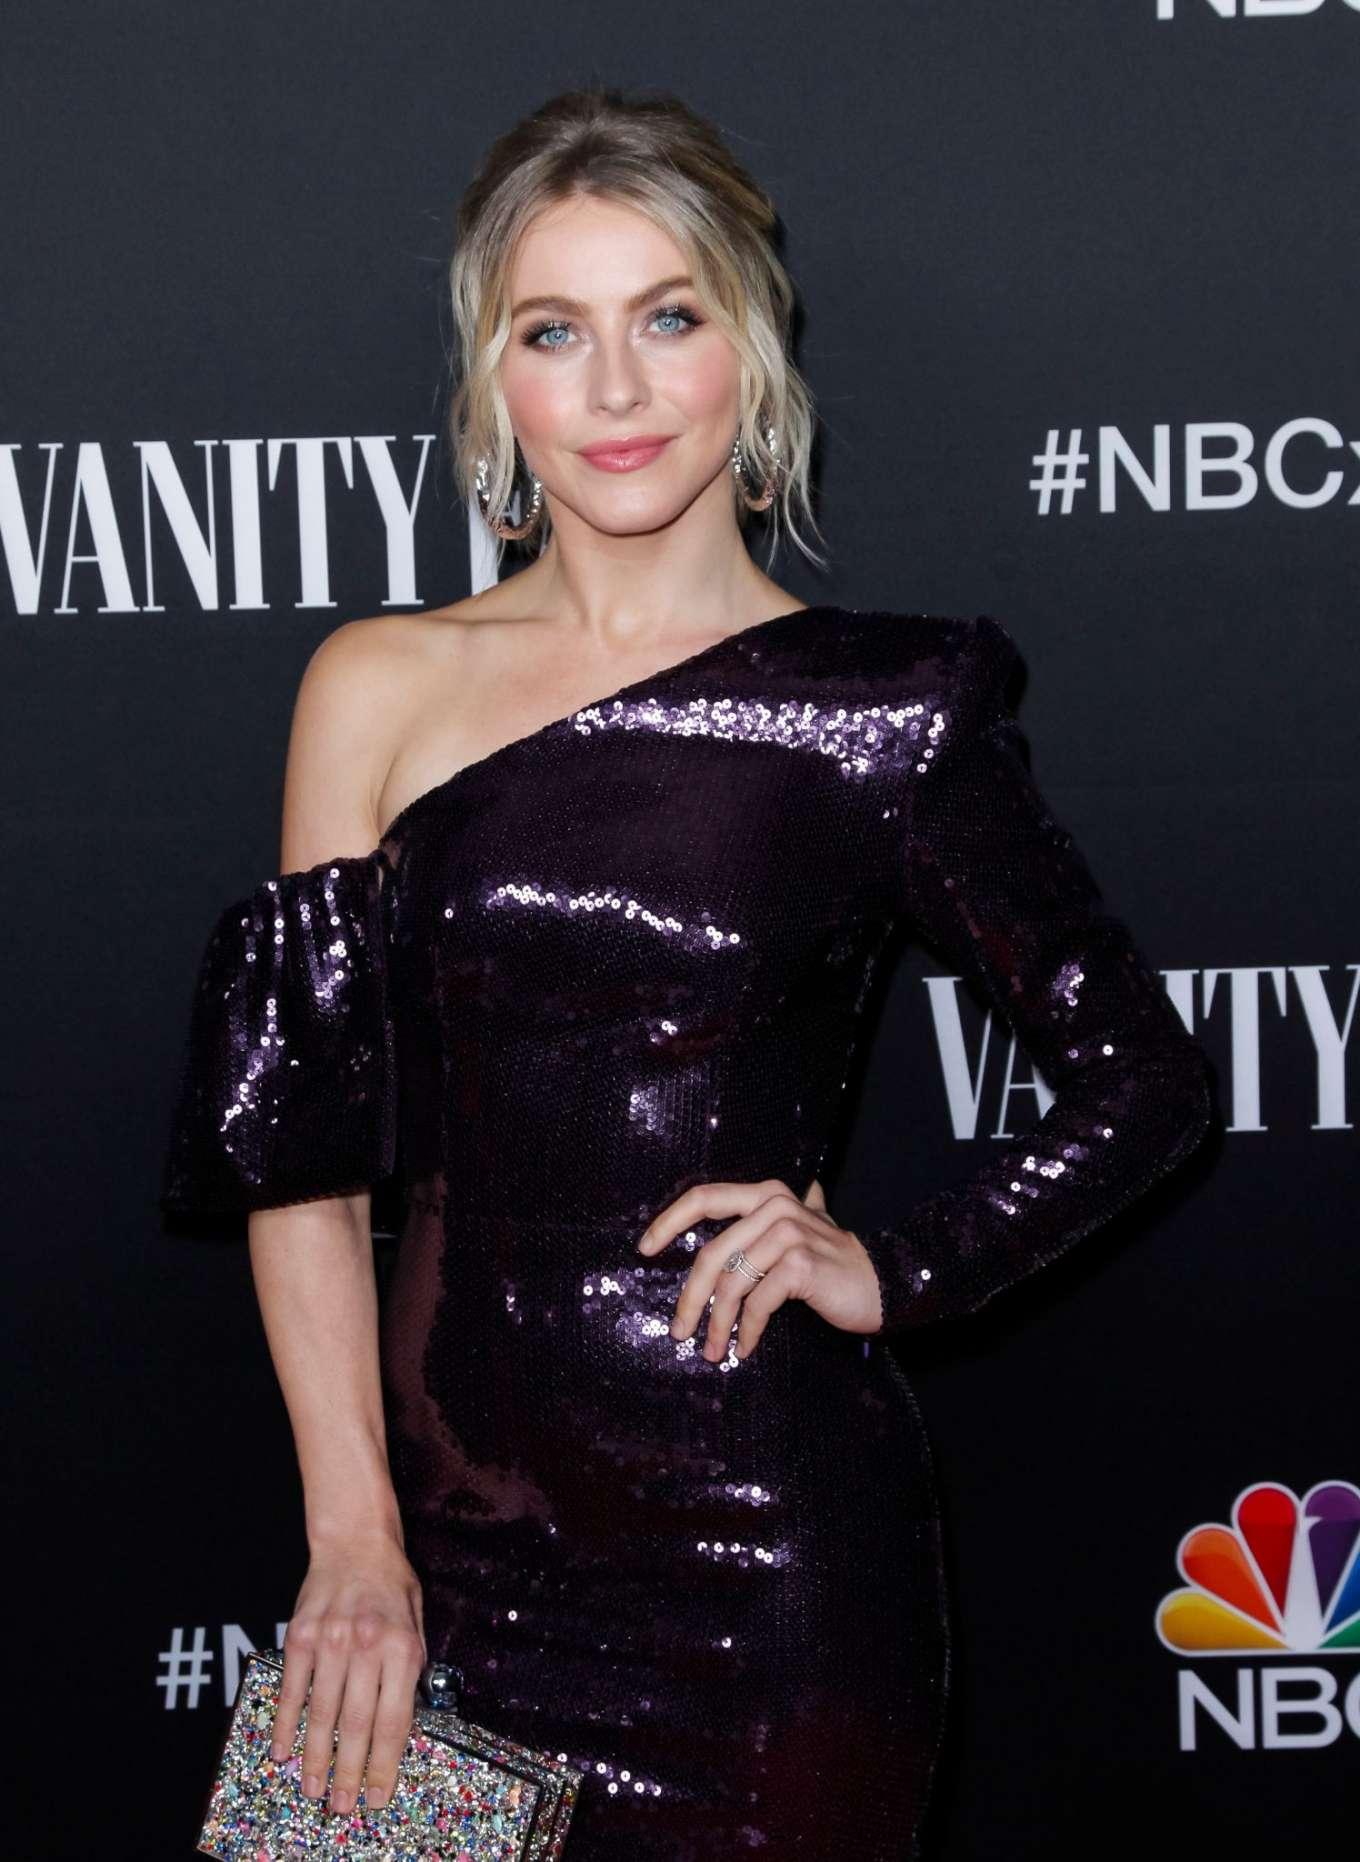 Julianne Hough 2019 : Julianne Hough – NBC and Vanity Fairs Celebration Of The Season-09